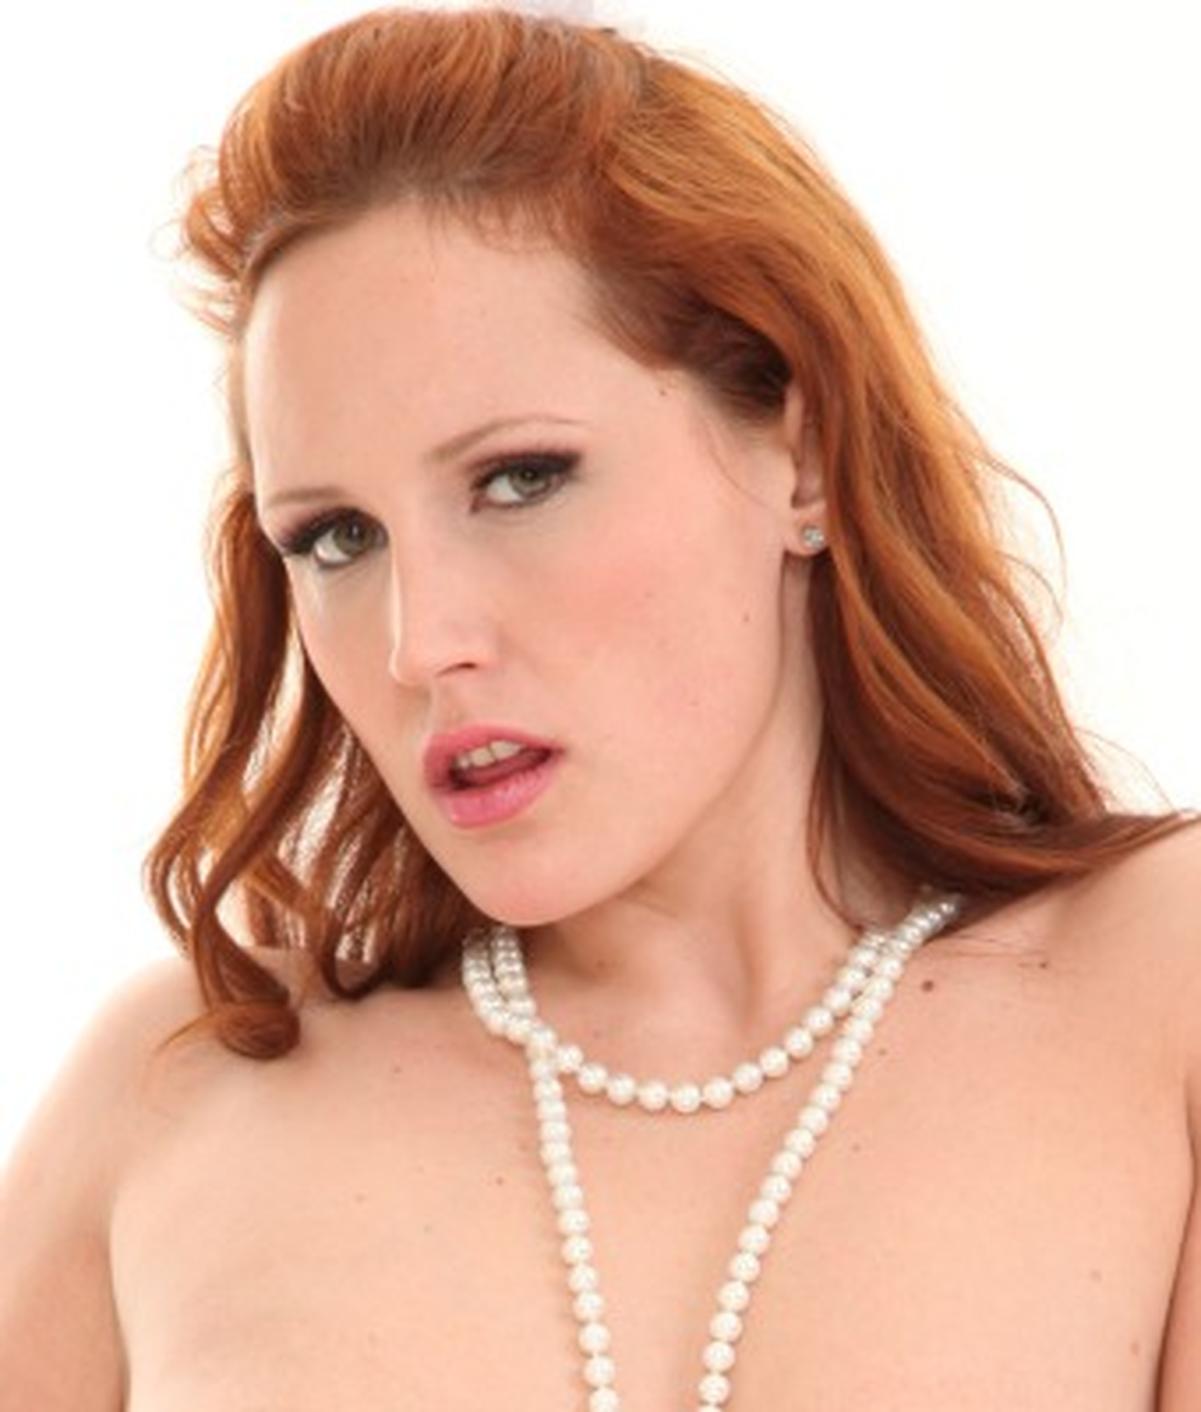 Film X Emy Russo emy russo wiki & bio - pornographic actress